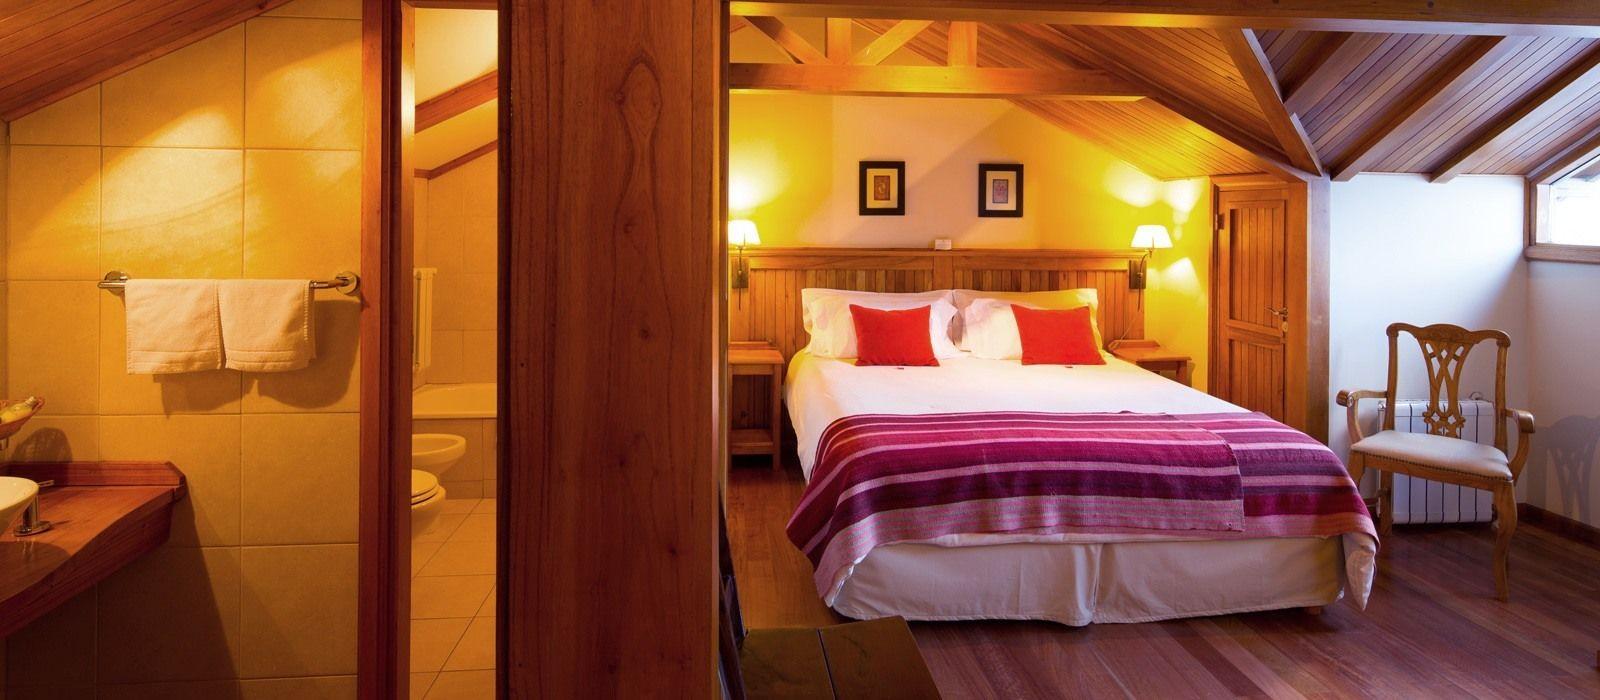 Hotel Hosteria Senderos Argentina